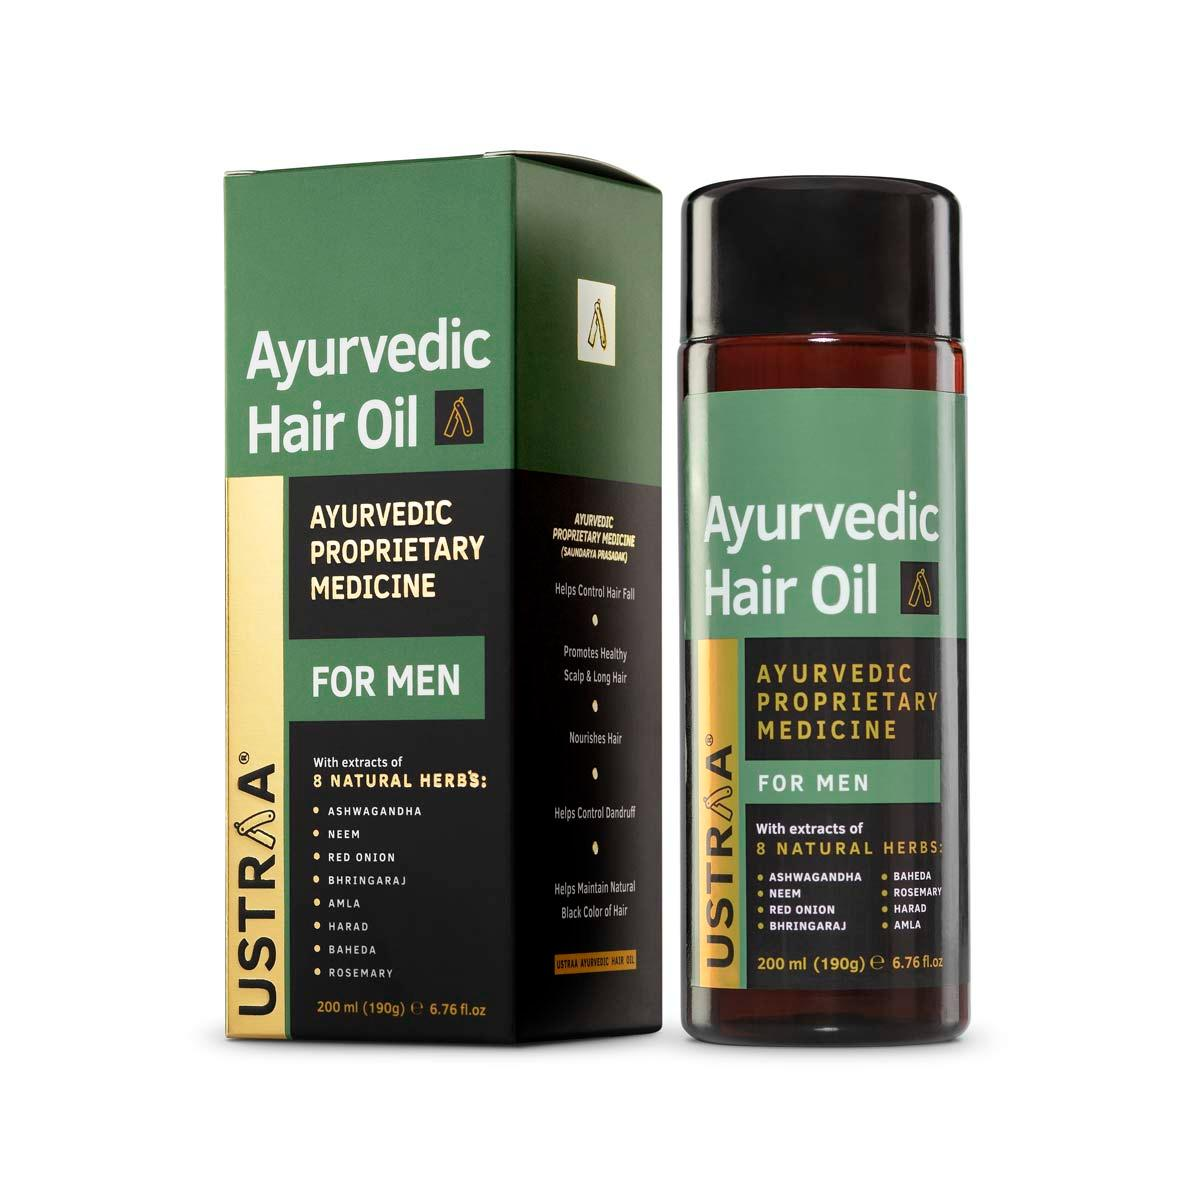 Ustraa's Ayurvedic Hair Oil for Men 200 ml - With Ayurvedic Ingredients like Sushruta, Charak, and Bhrigu